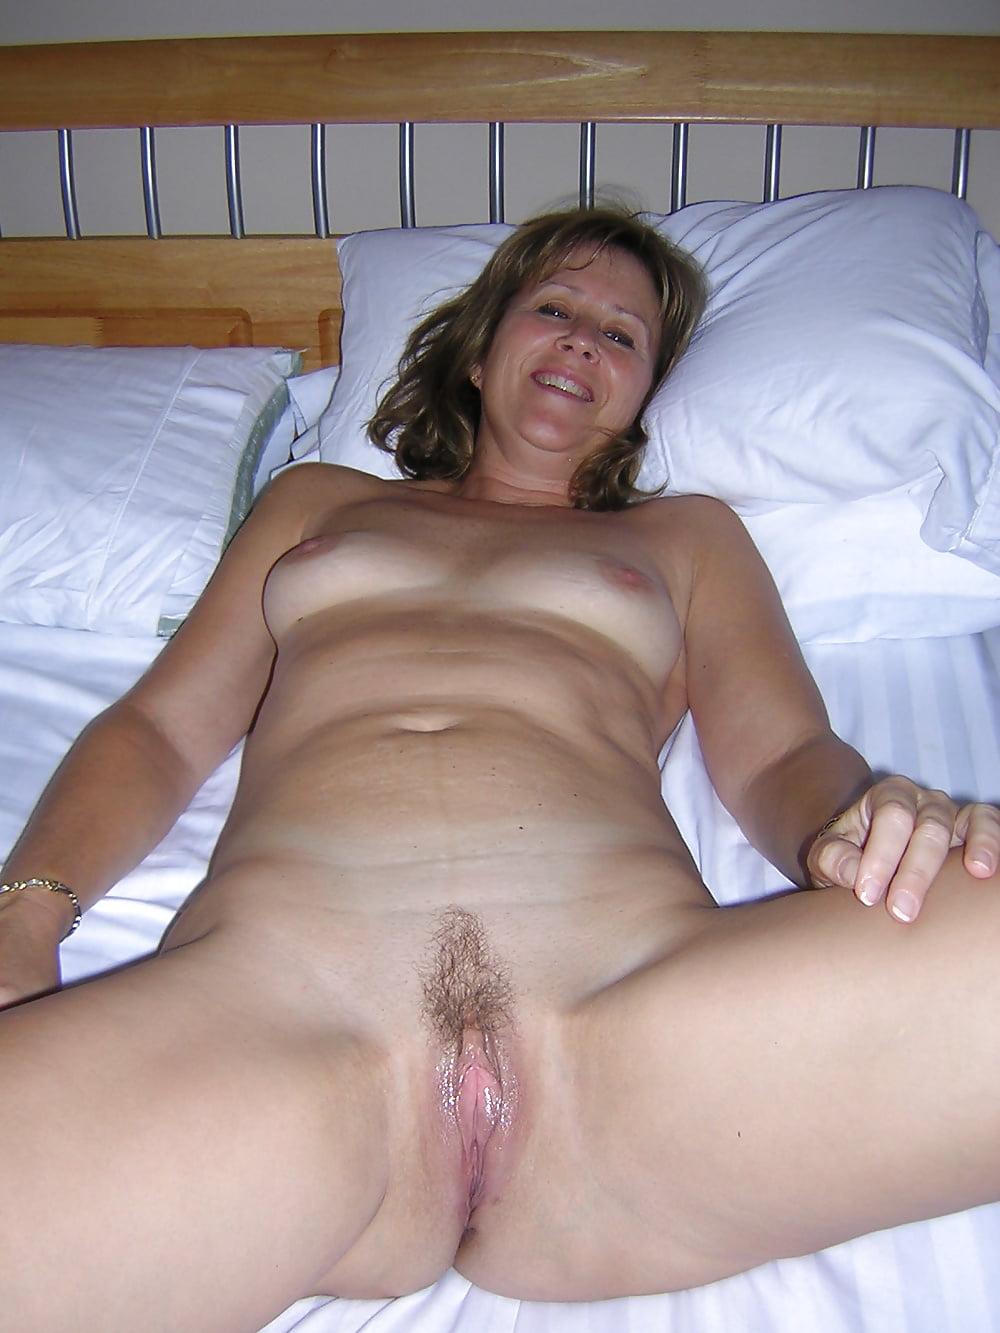 Sexy Nude Wife Fap Pics